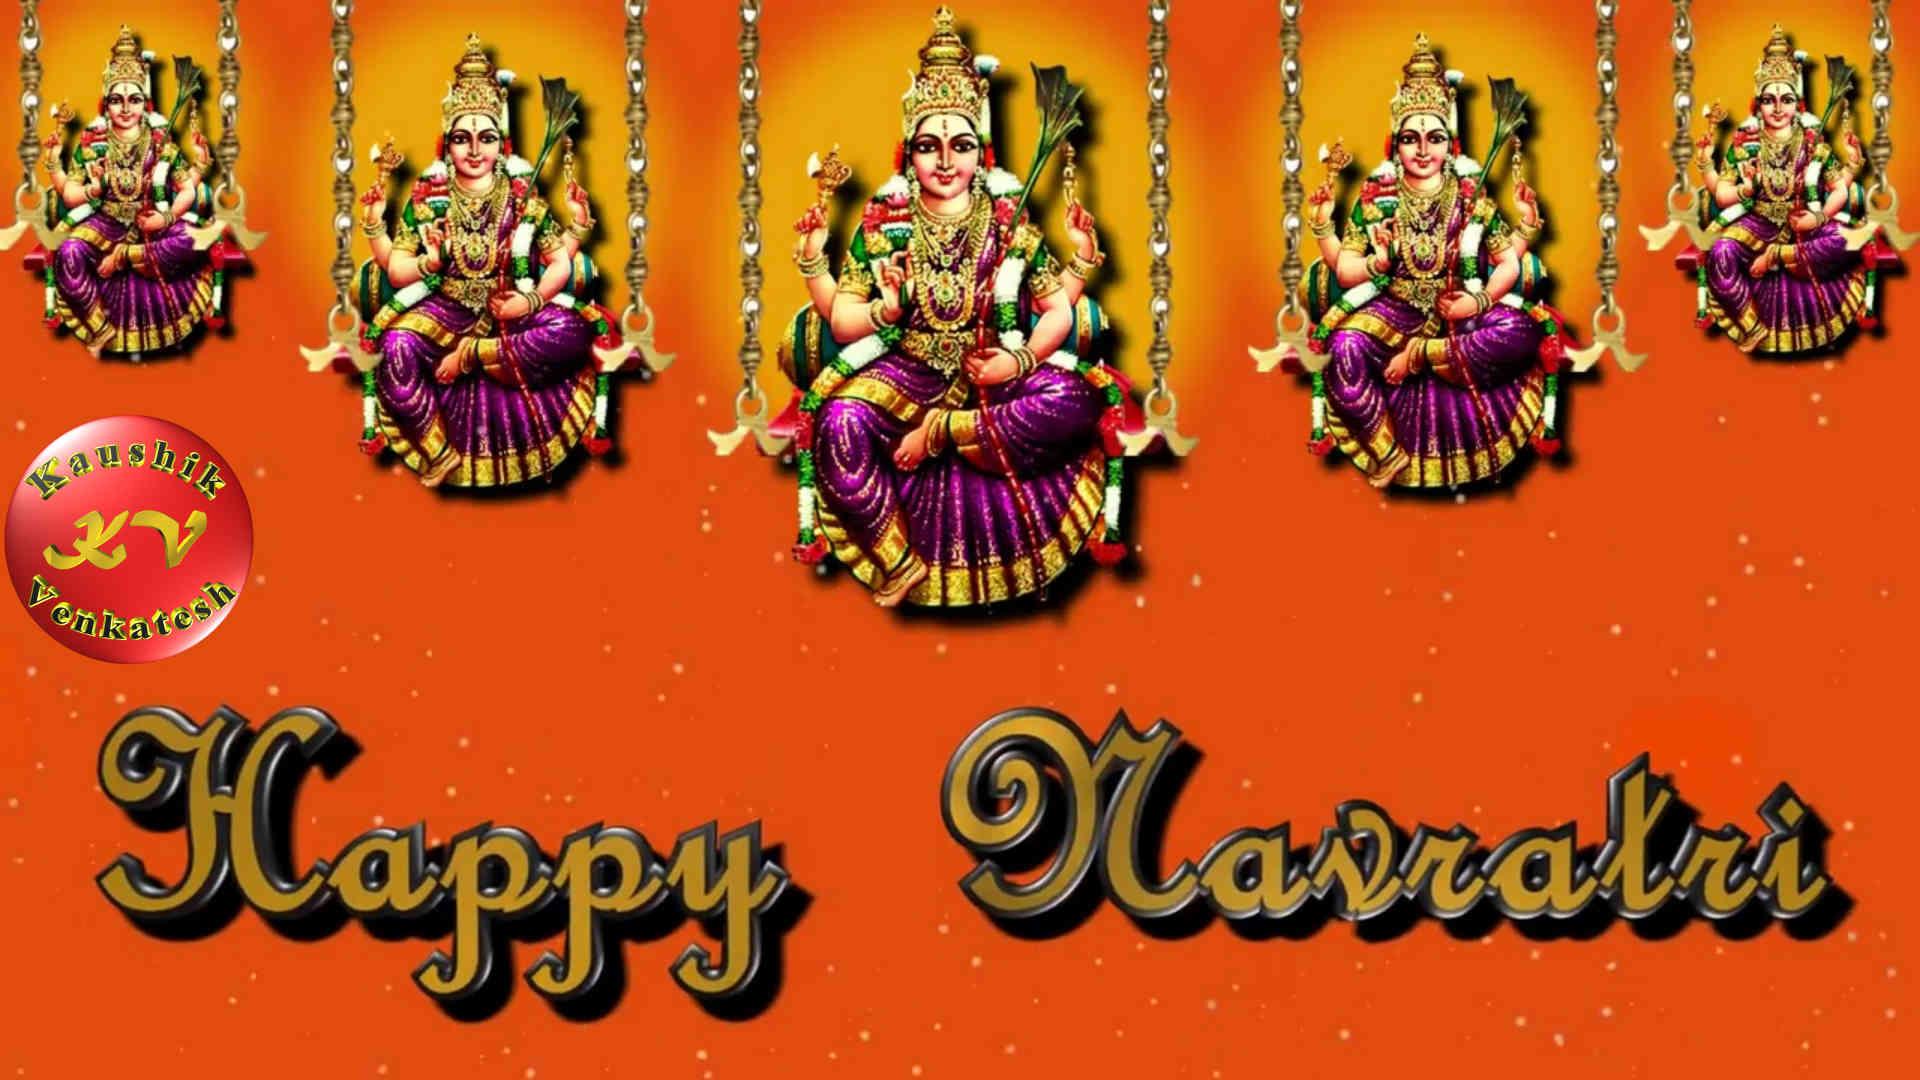 Happy Navratri HD Image